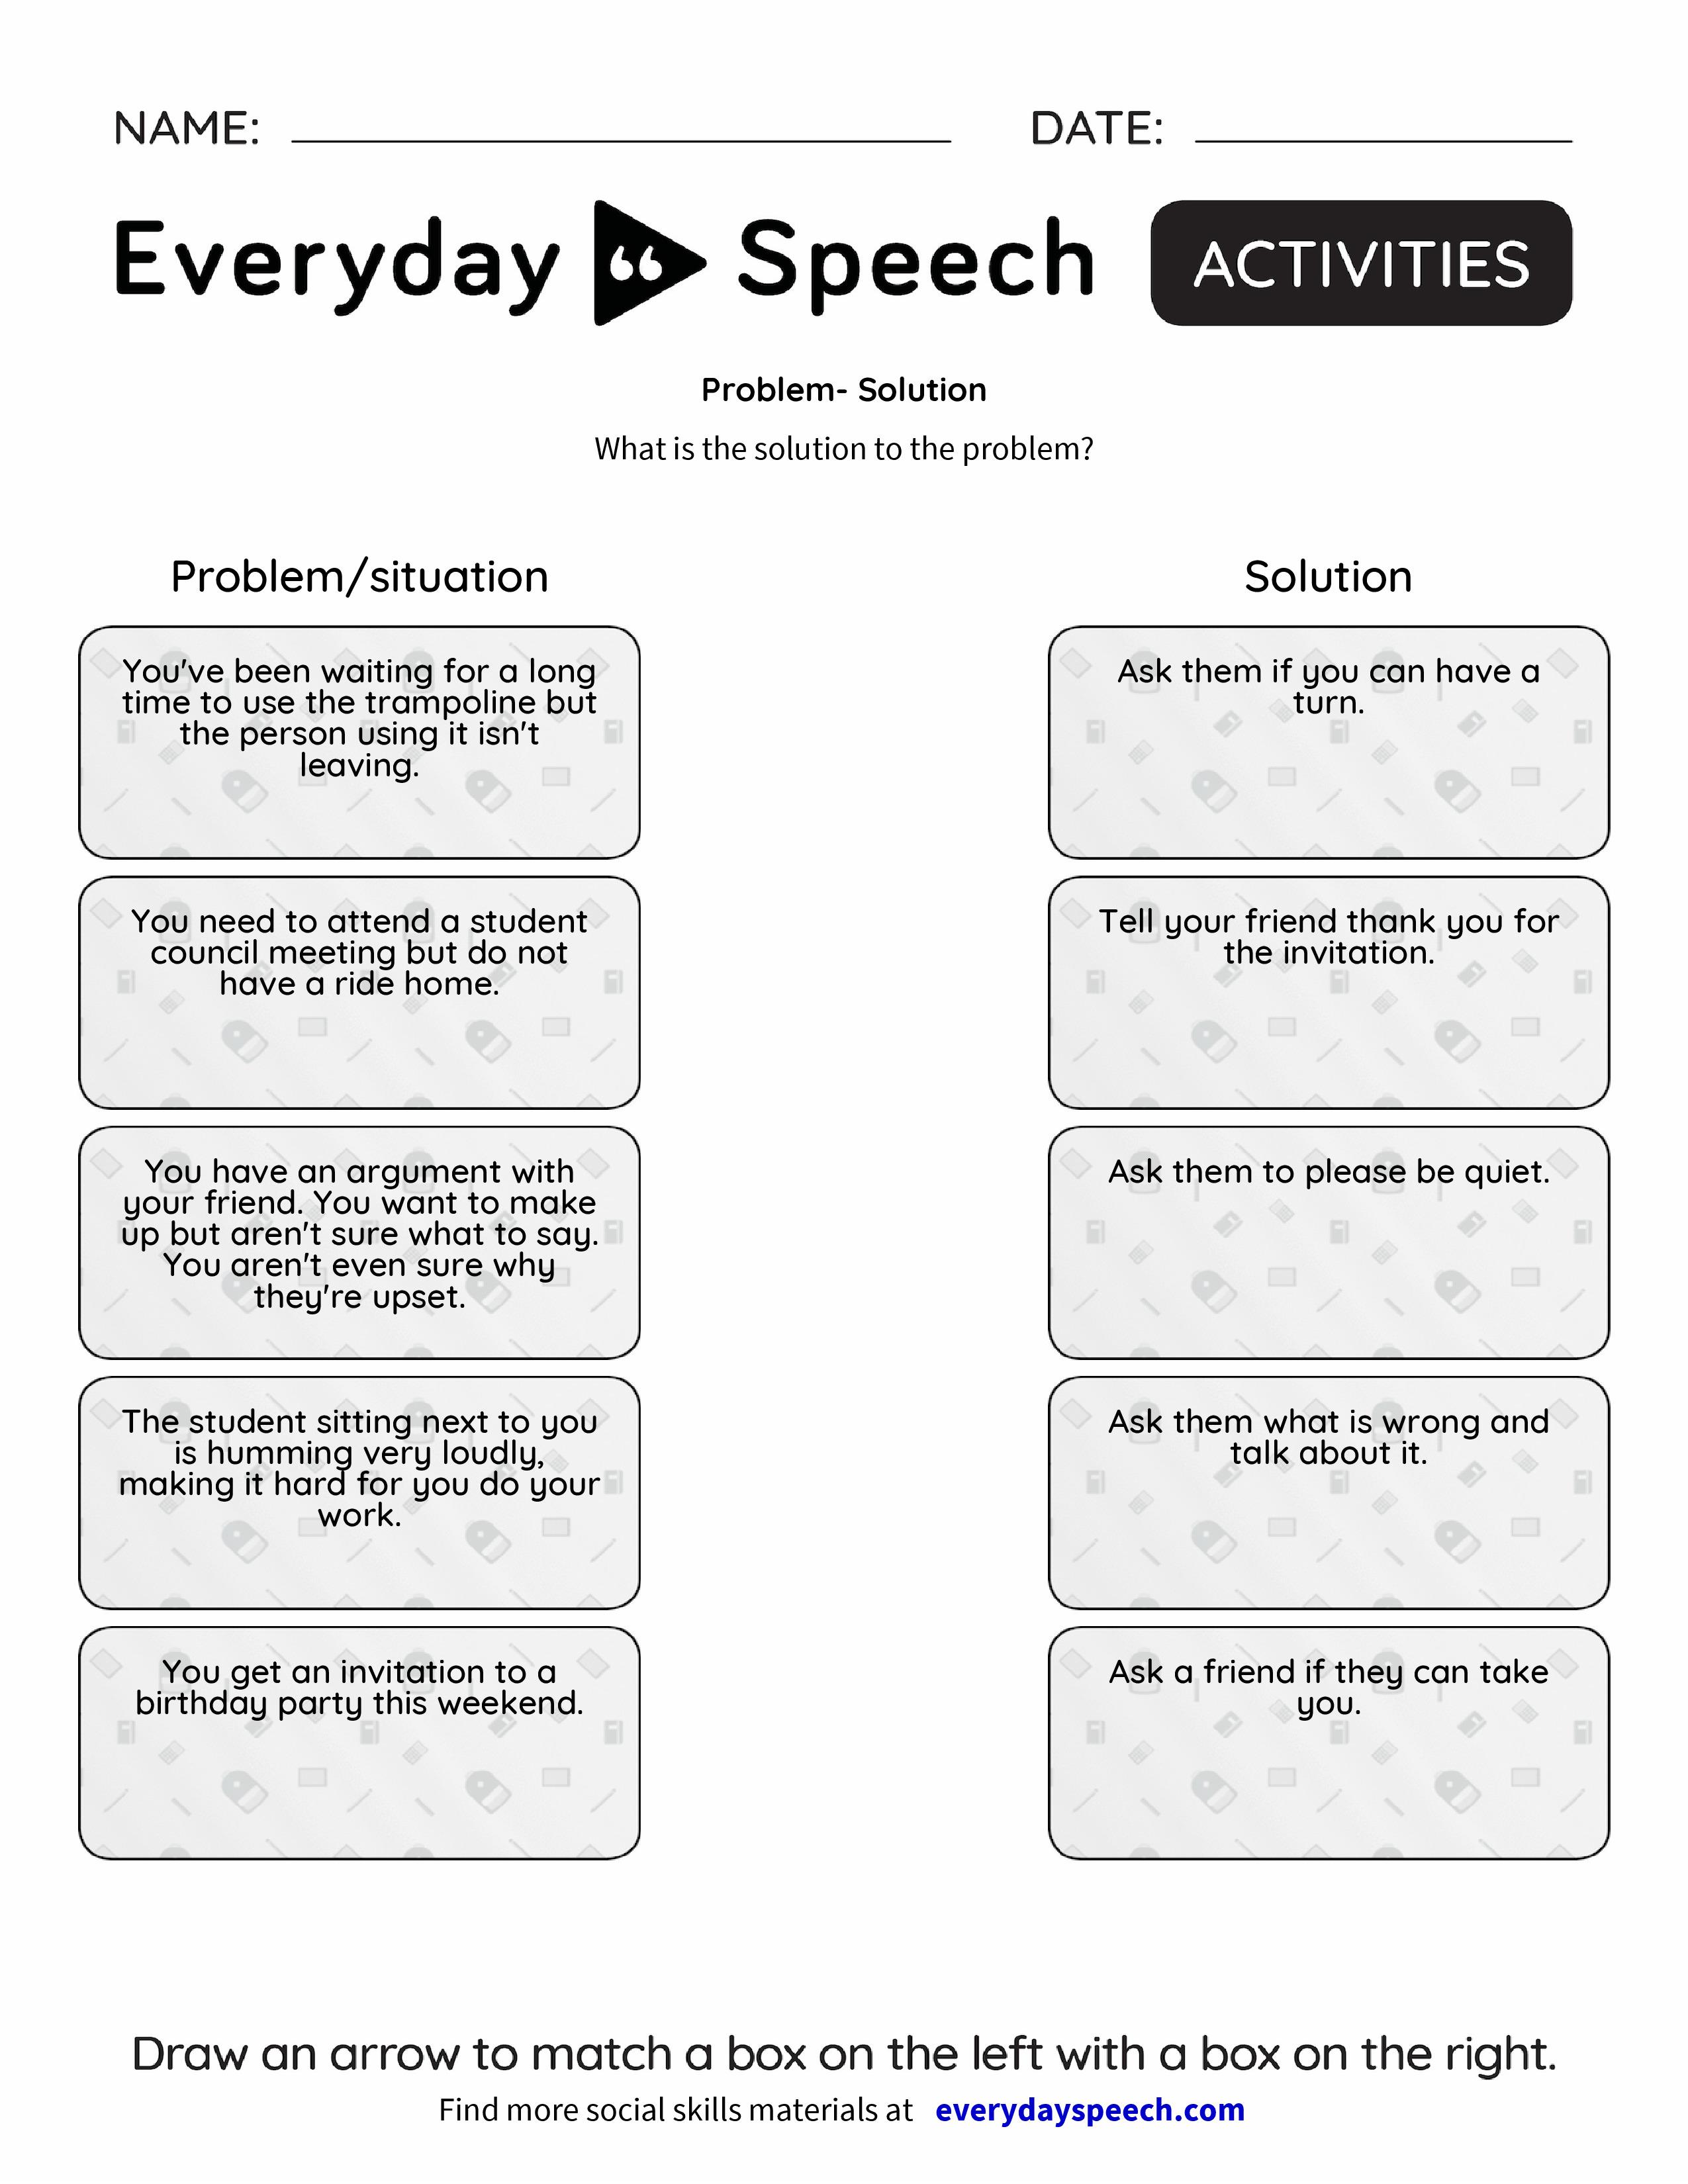 Problem Solution Everyday Speech Everyday Speech